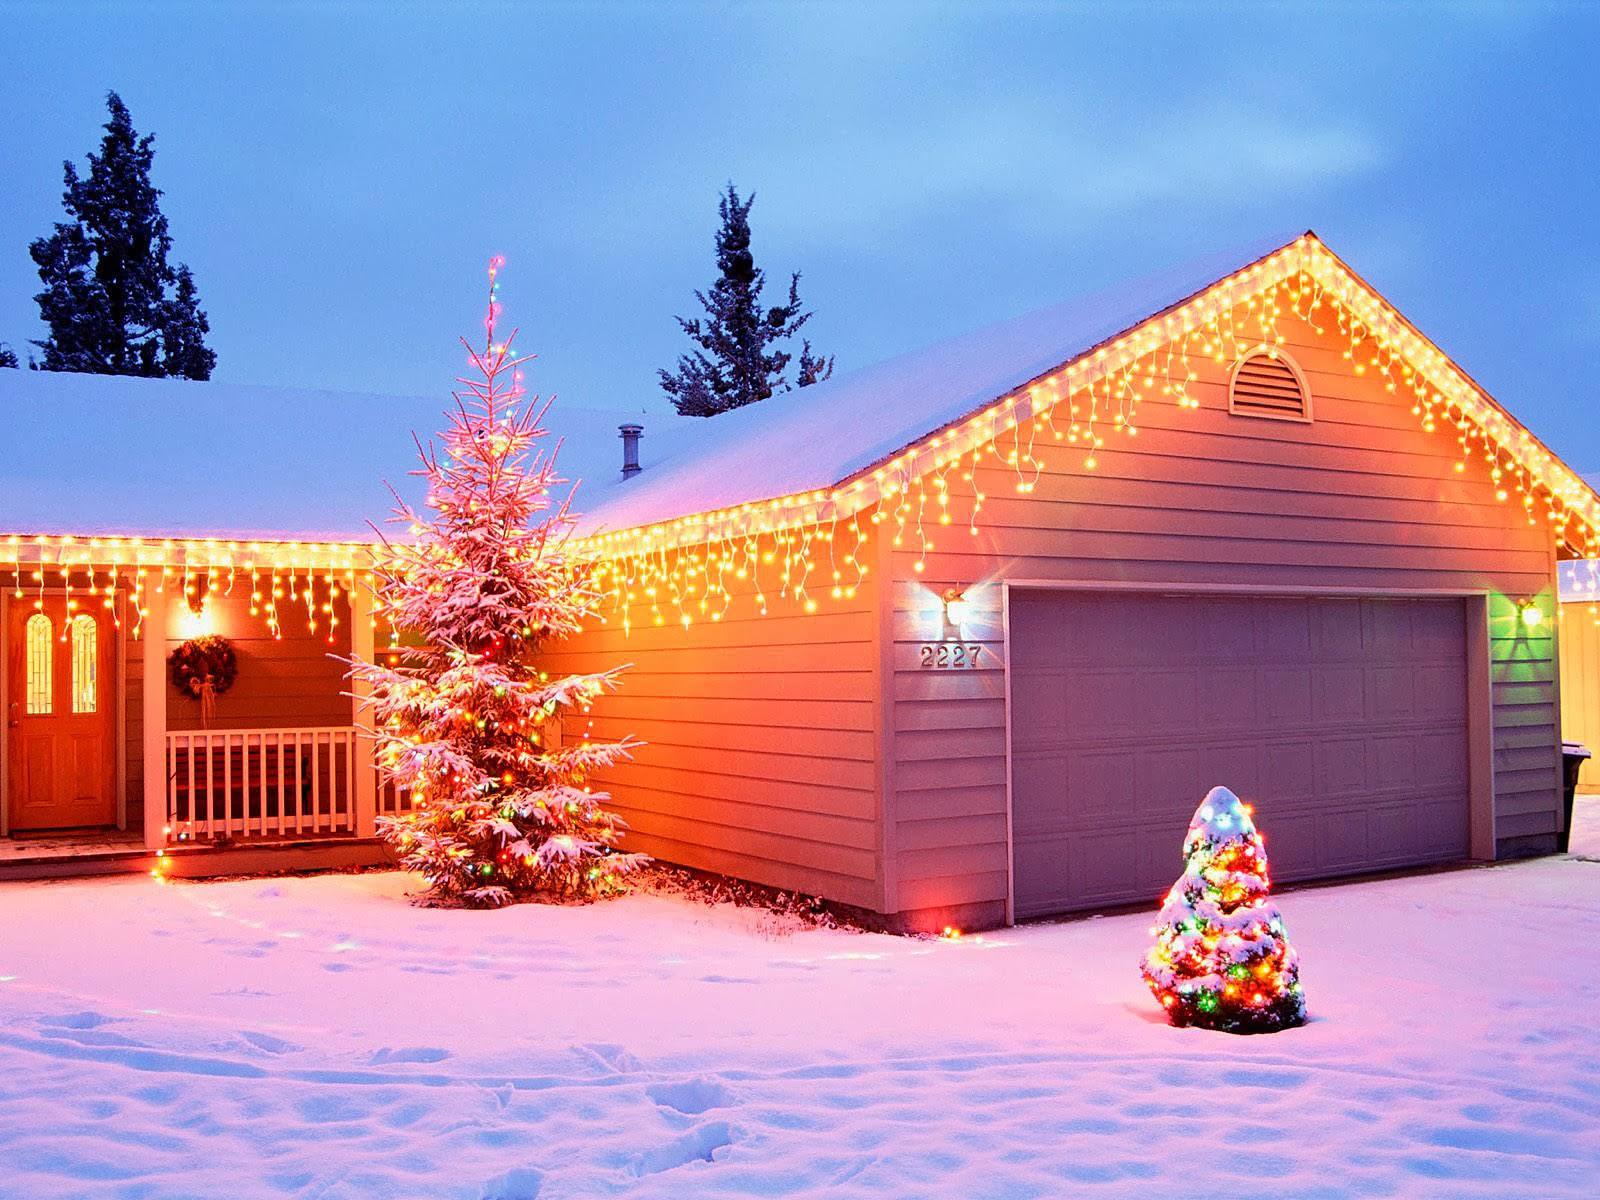 11 Christmas wallpapers free house with christmas lights wallpaperjpg 1600x1200